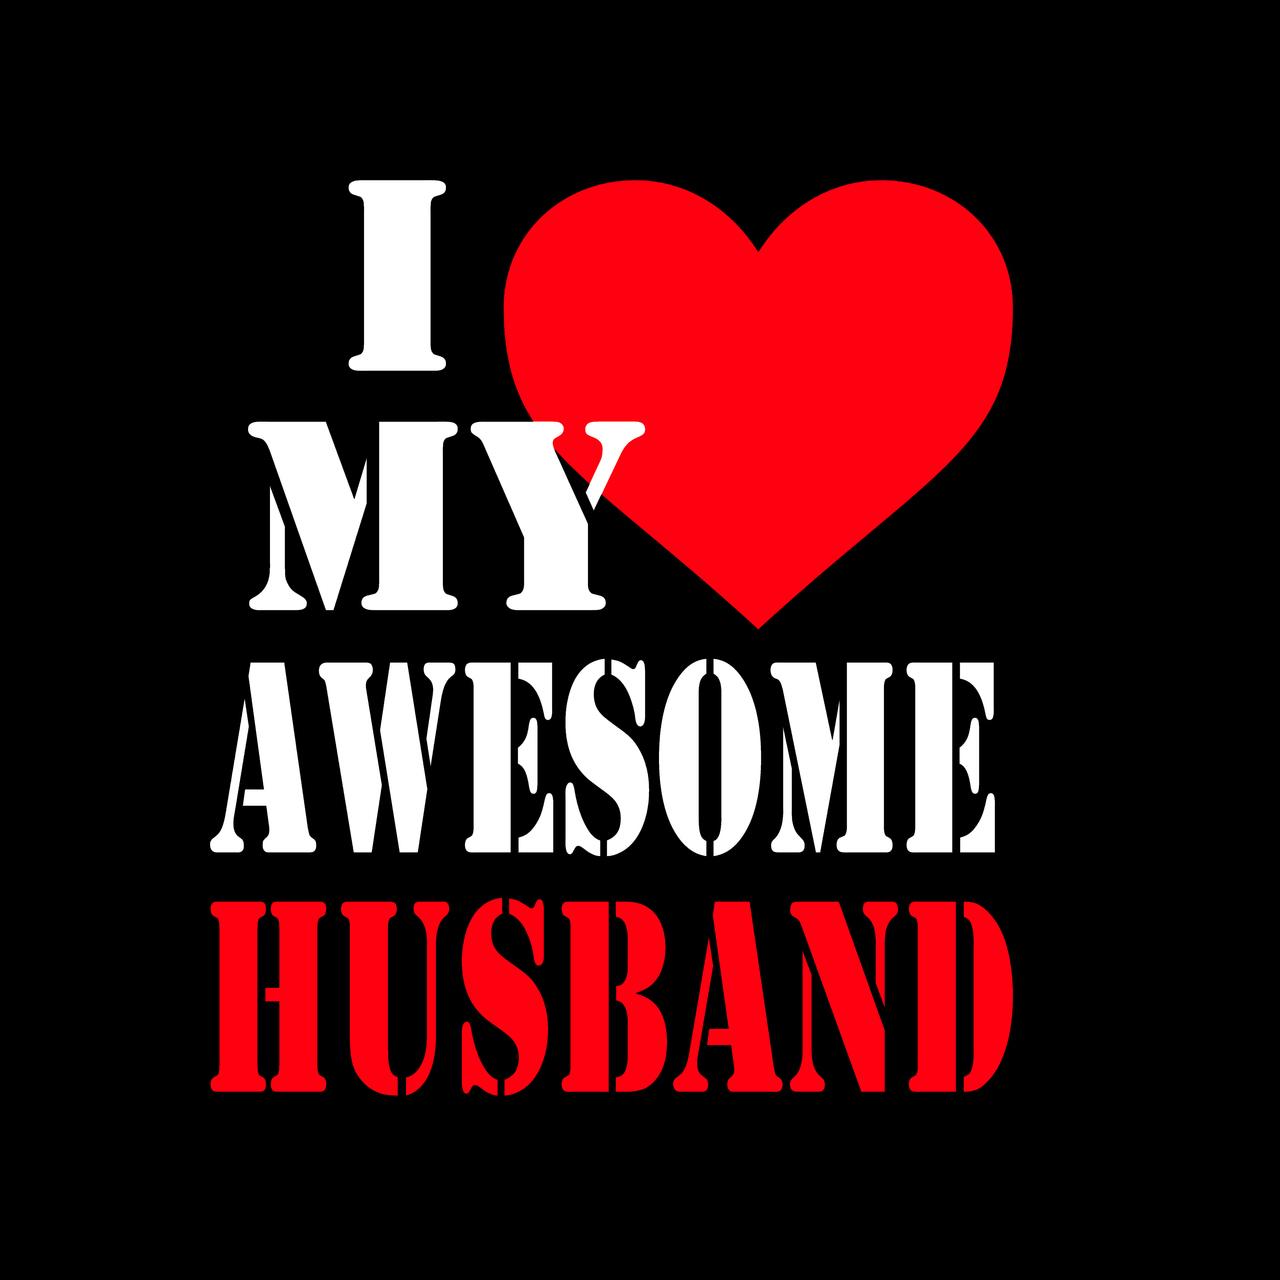 I Love My Husband Image